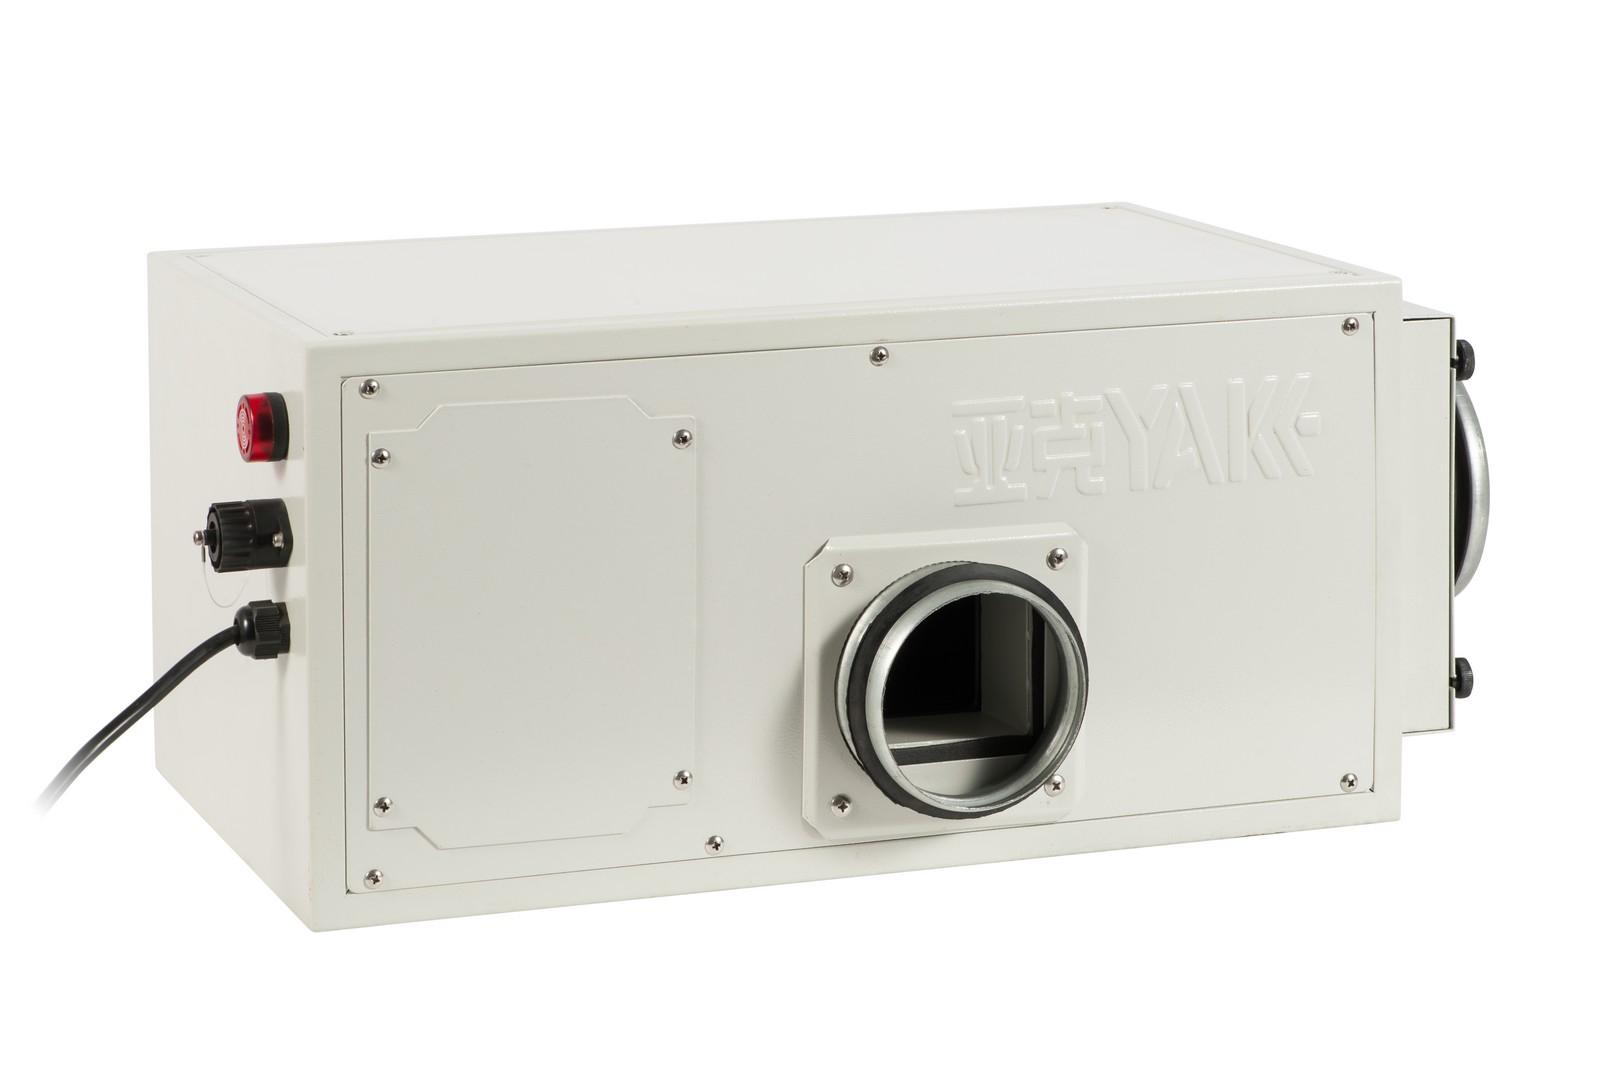 220v Buy Wall Mounted Dehumidifiers Industrial Dehumidifier Air #B11A2A